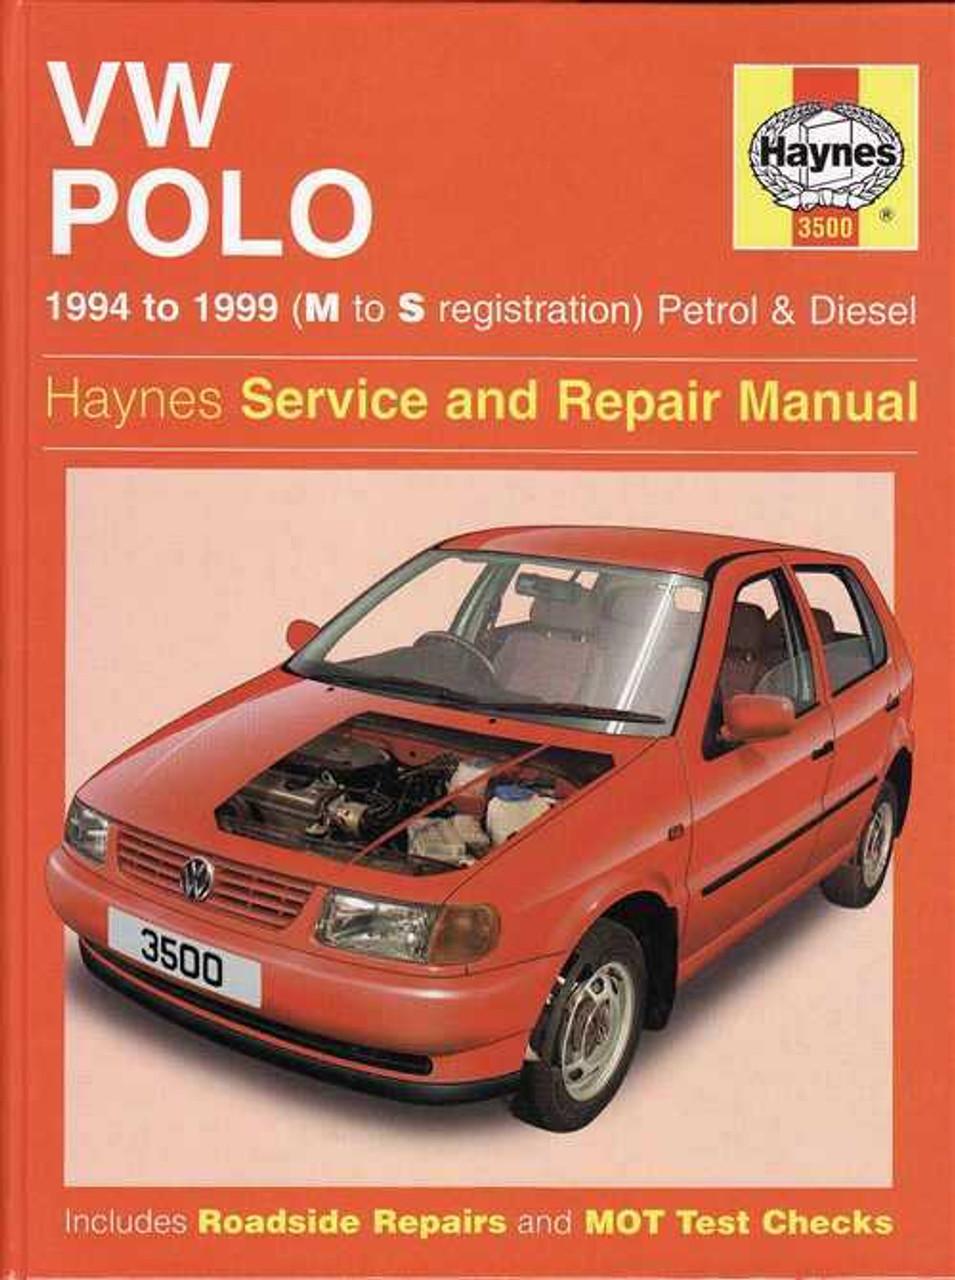 volkswagen polo 1994 1999 workshop manual rh automotobookshop com au 2015 Volkswagen Polo 2015 Volkswagen Polo